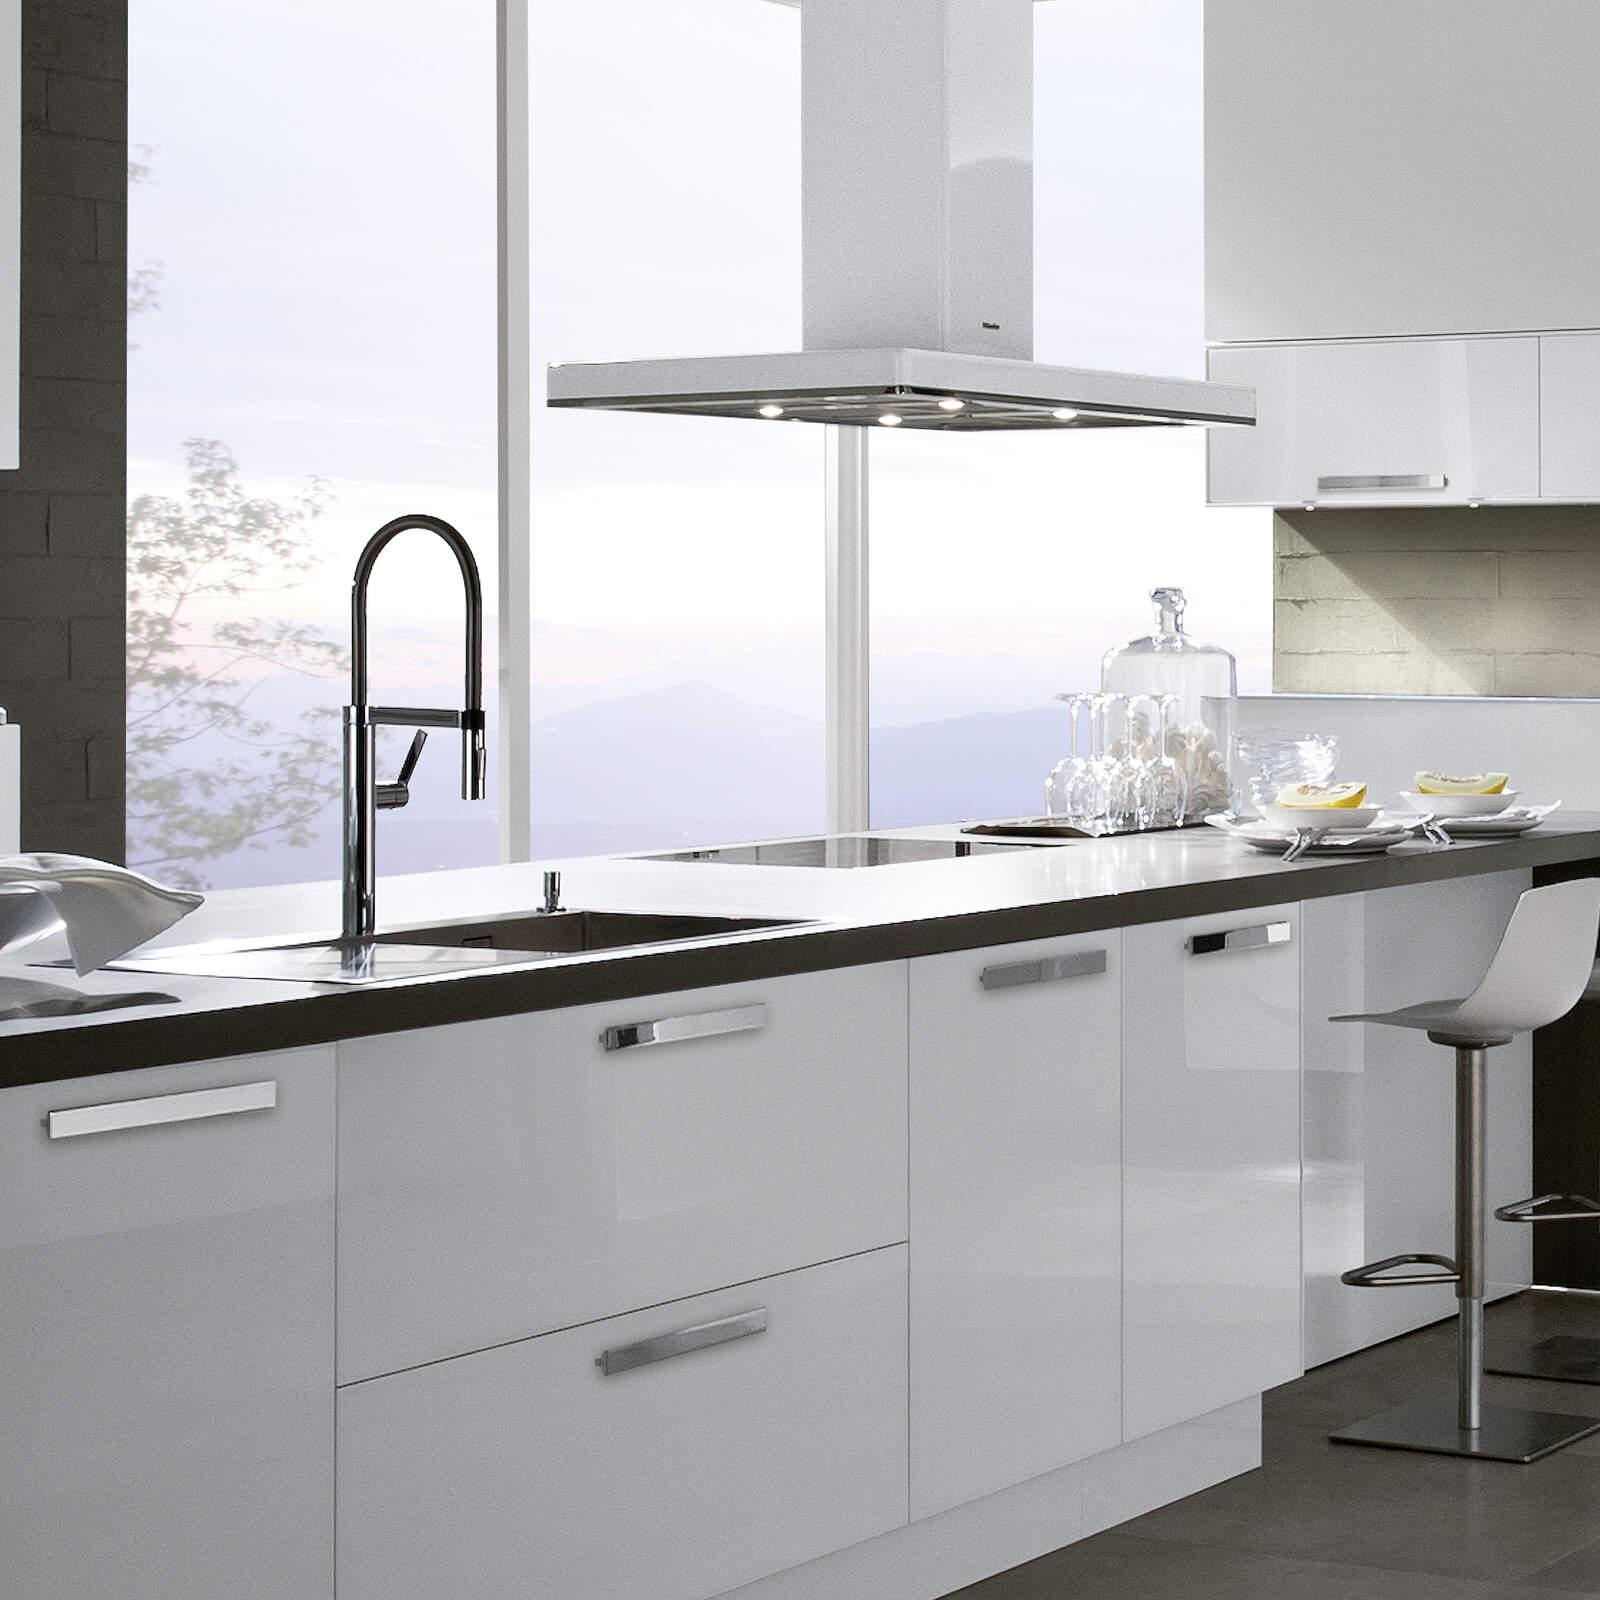 wordbrain 2 k che plexiglas r ckw nde k che k che. Black Bedroom Furniture Sets. Home Design Ideas